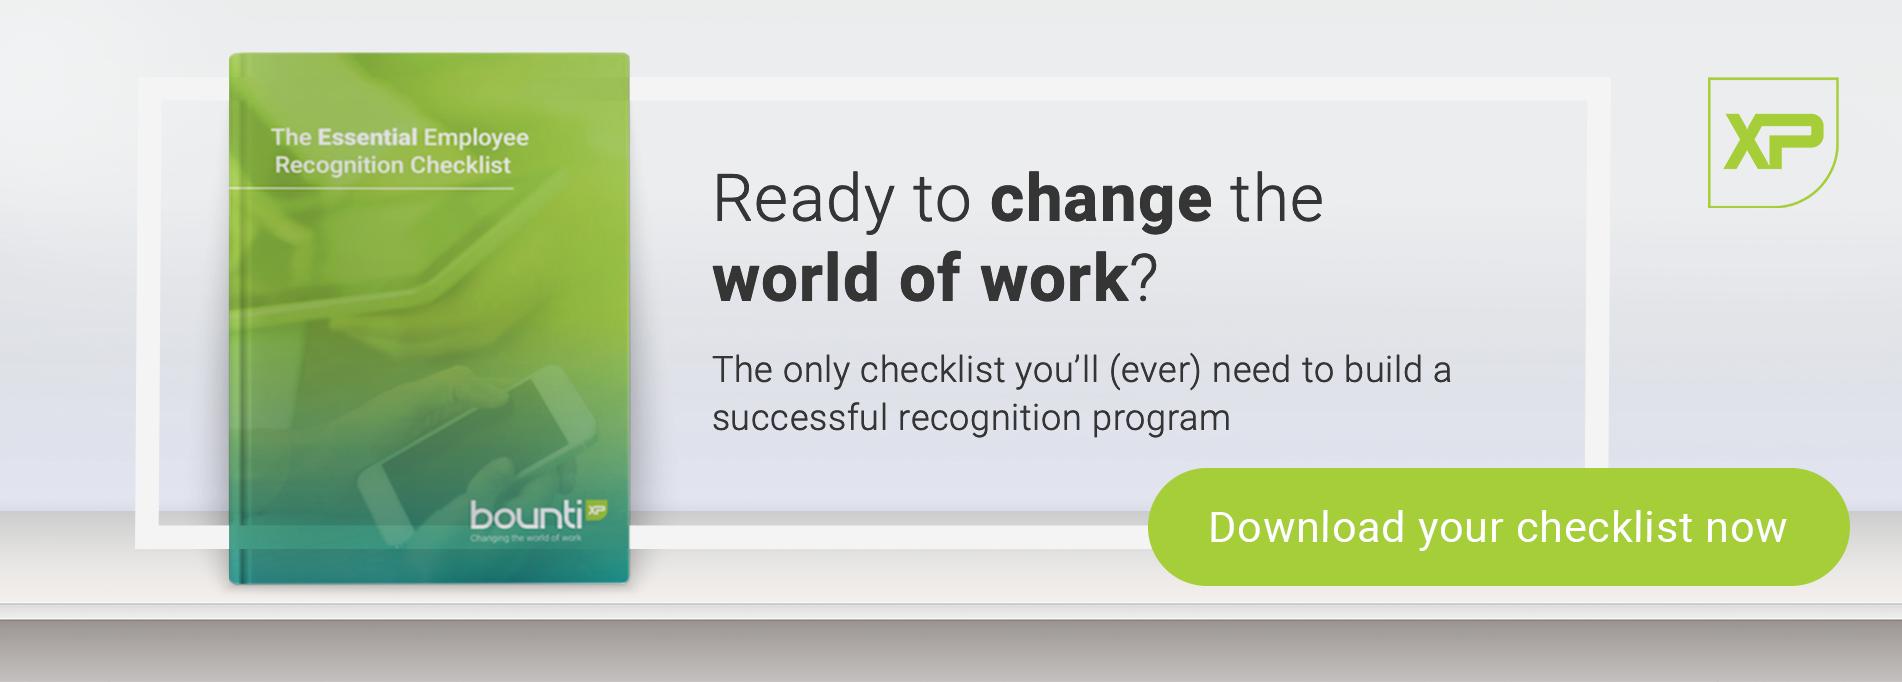 employee recognition checklist